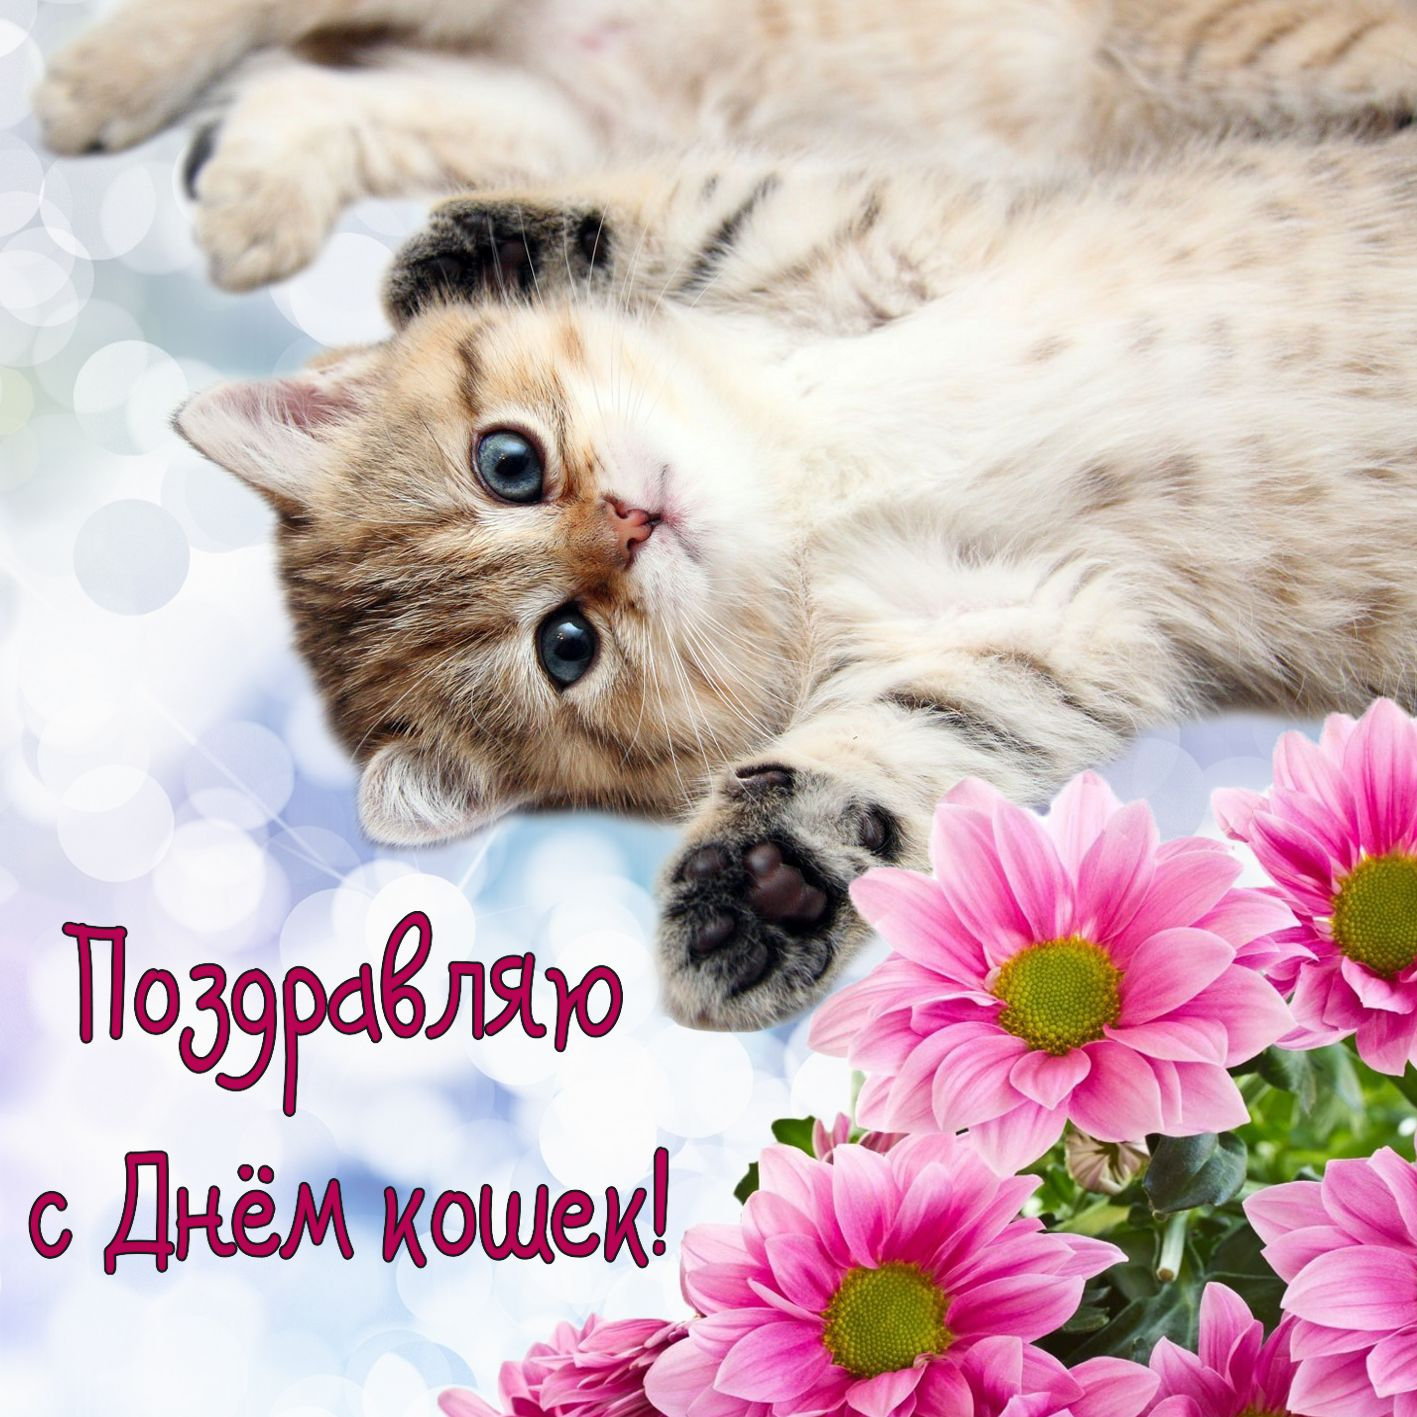 С днём кошки открытка 115